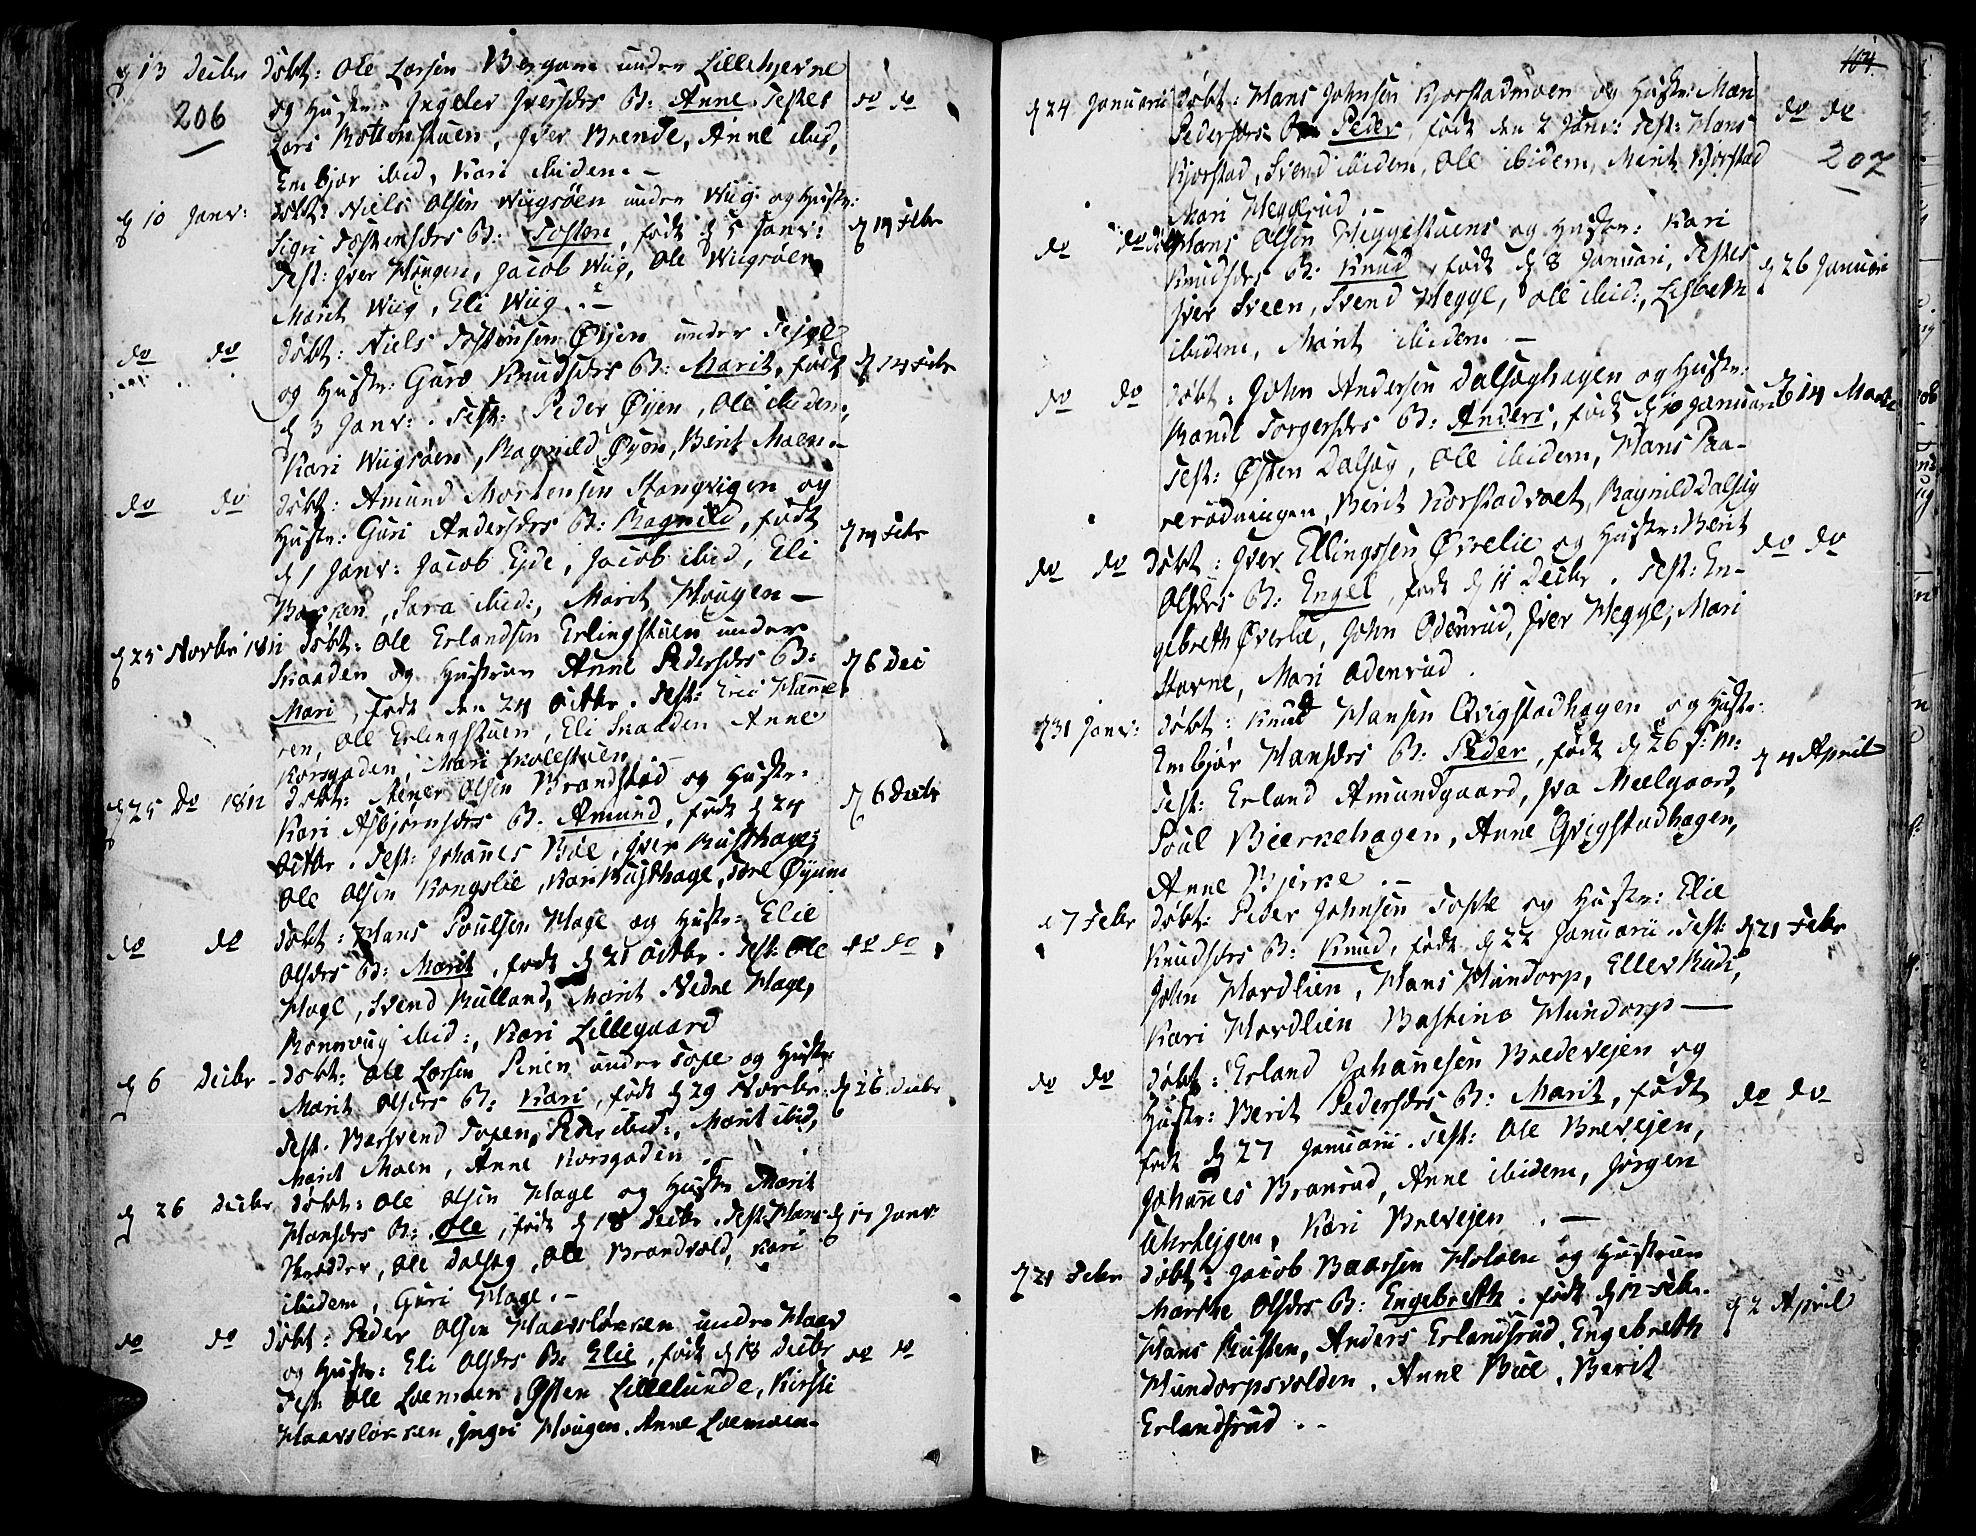 SAH, Fron prestekontor, H/Ha/Haa/L0001: Ministerialbok nr. 1, 1799-1816, s. 206-207